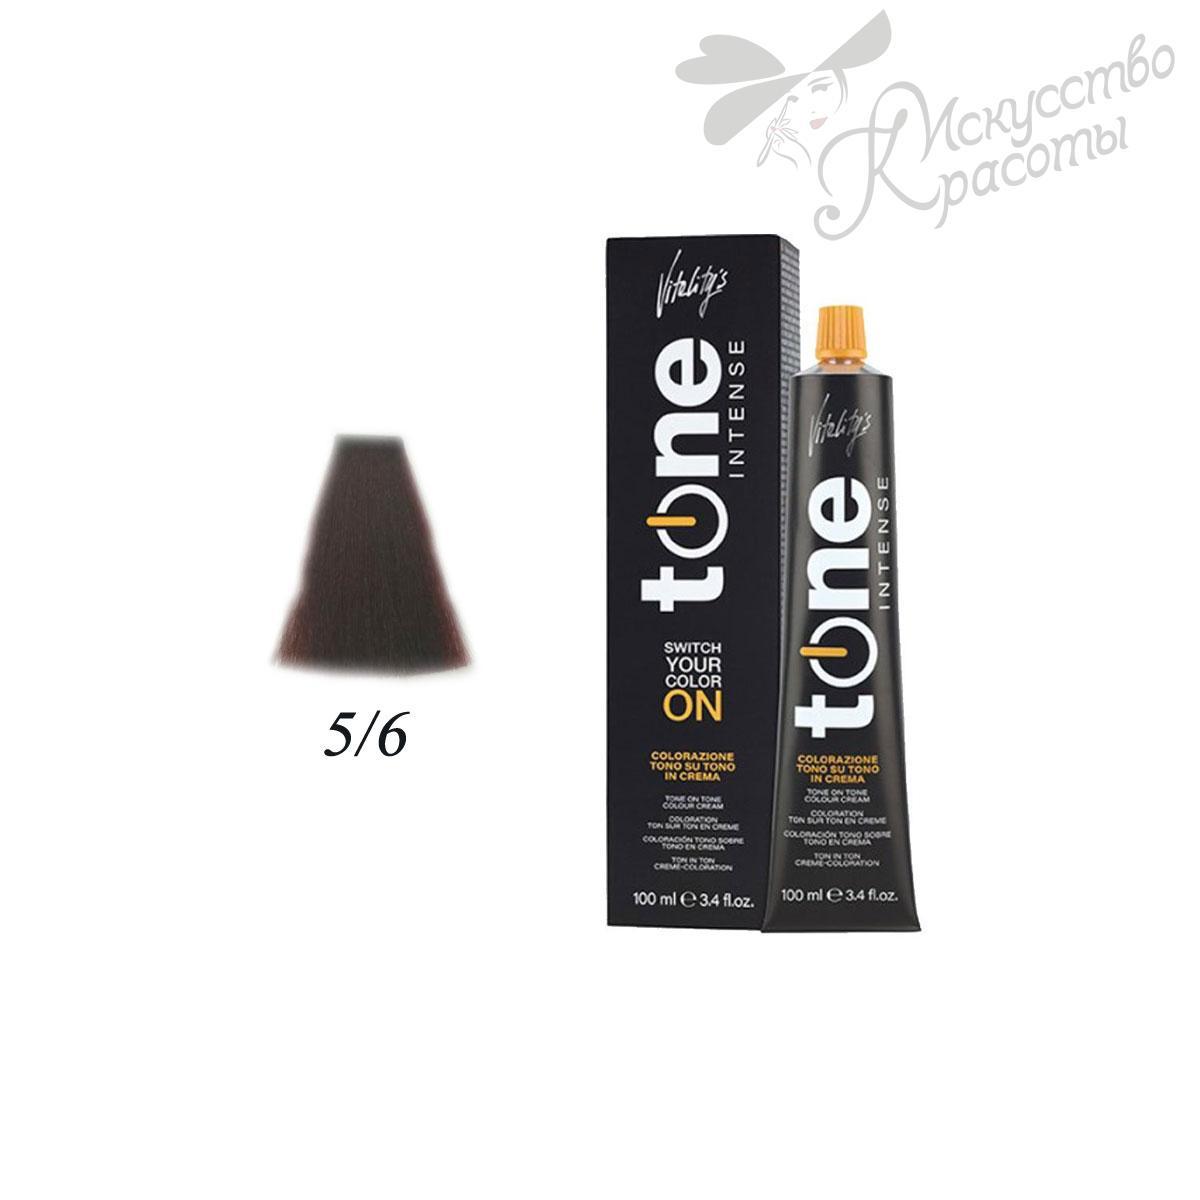 Краска для волос 5/6 красный светло-каштановый Tone Intense Vitality's 100мл